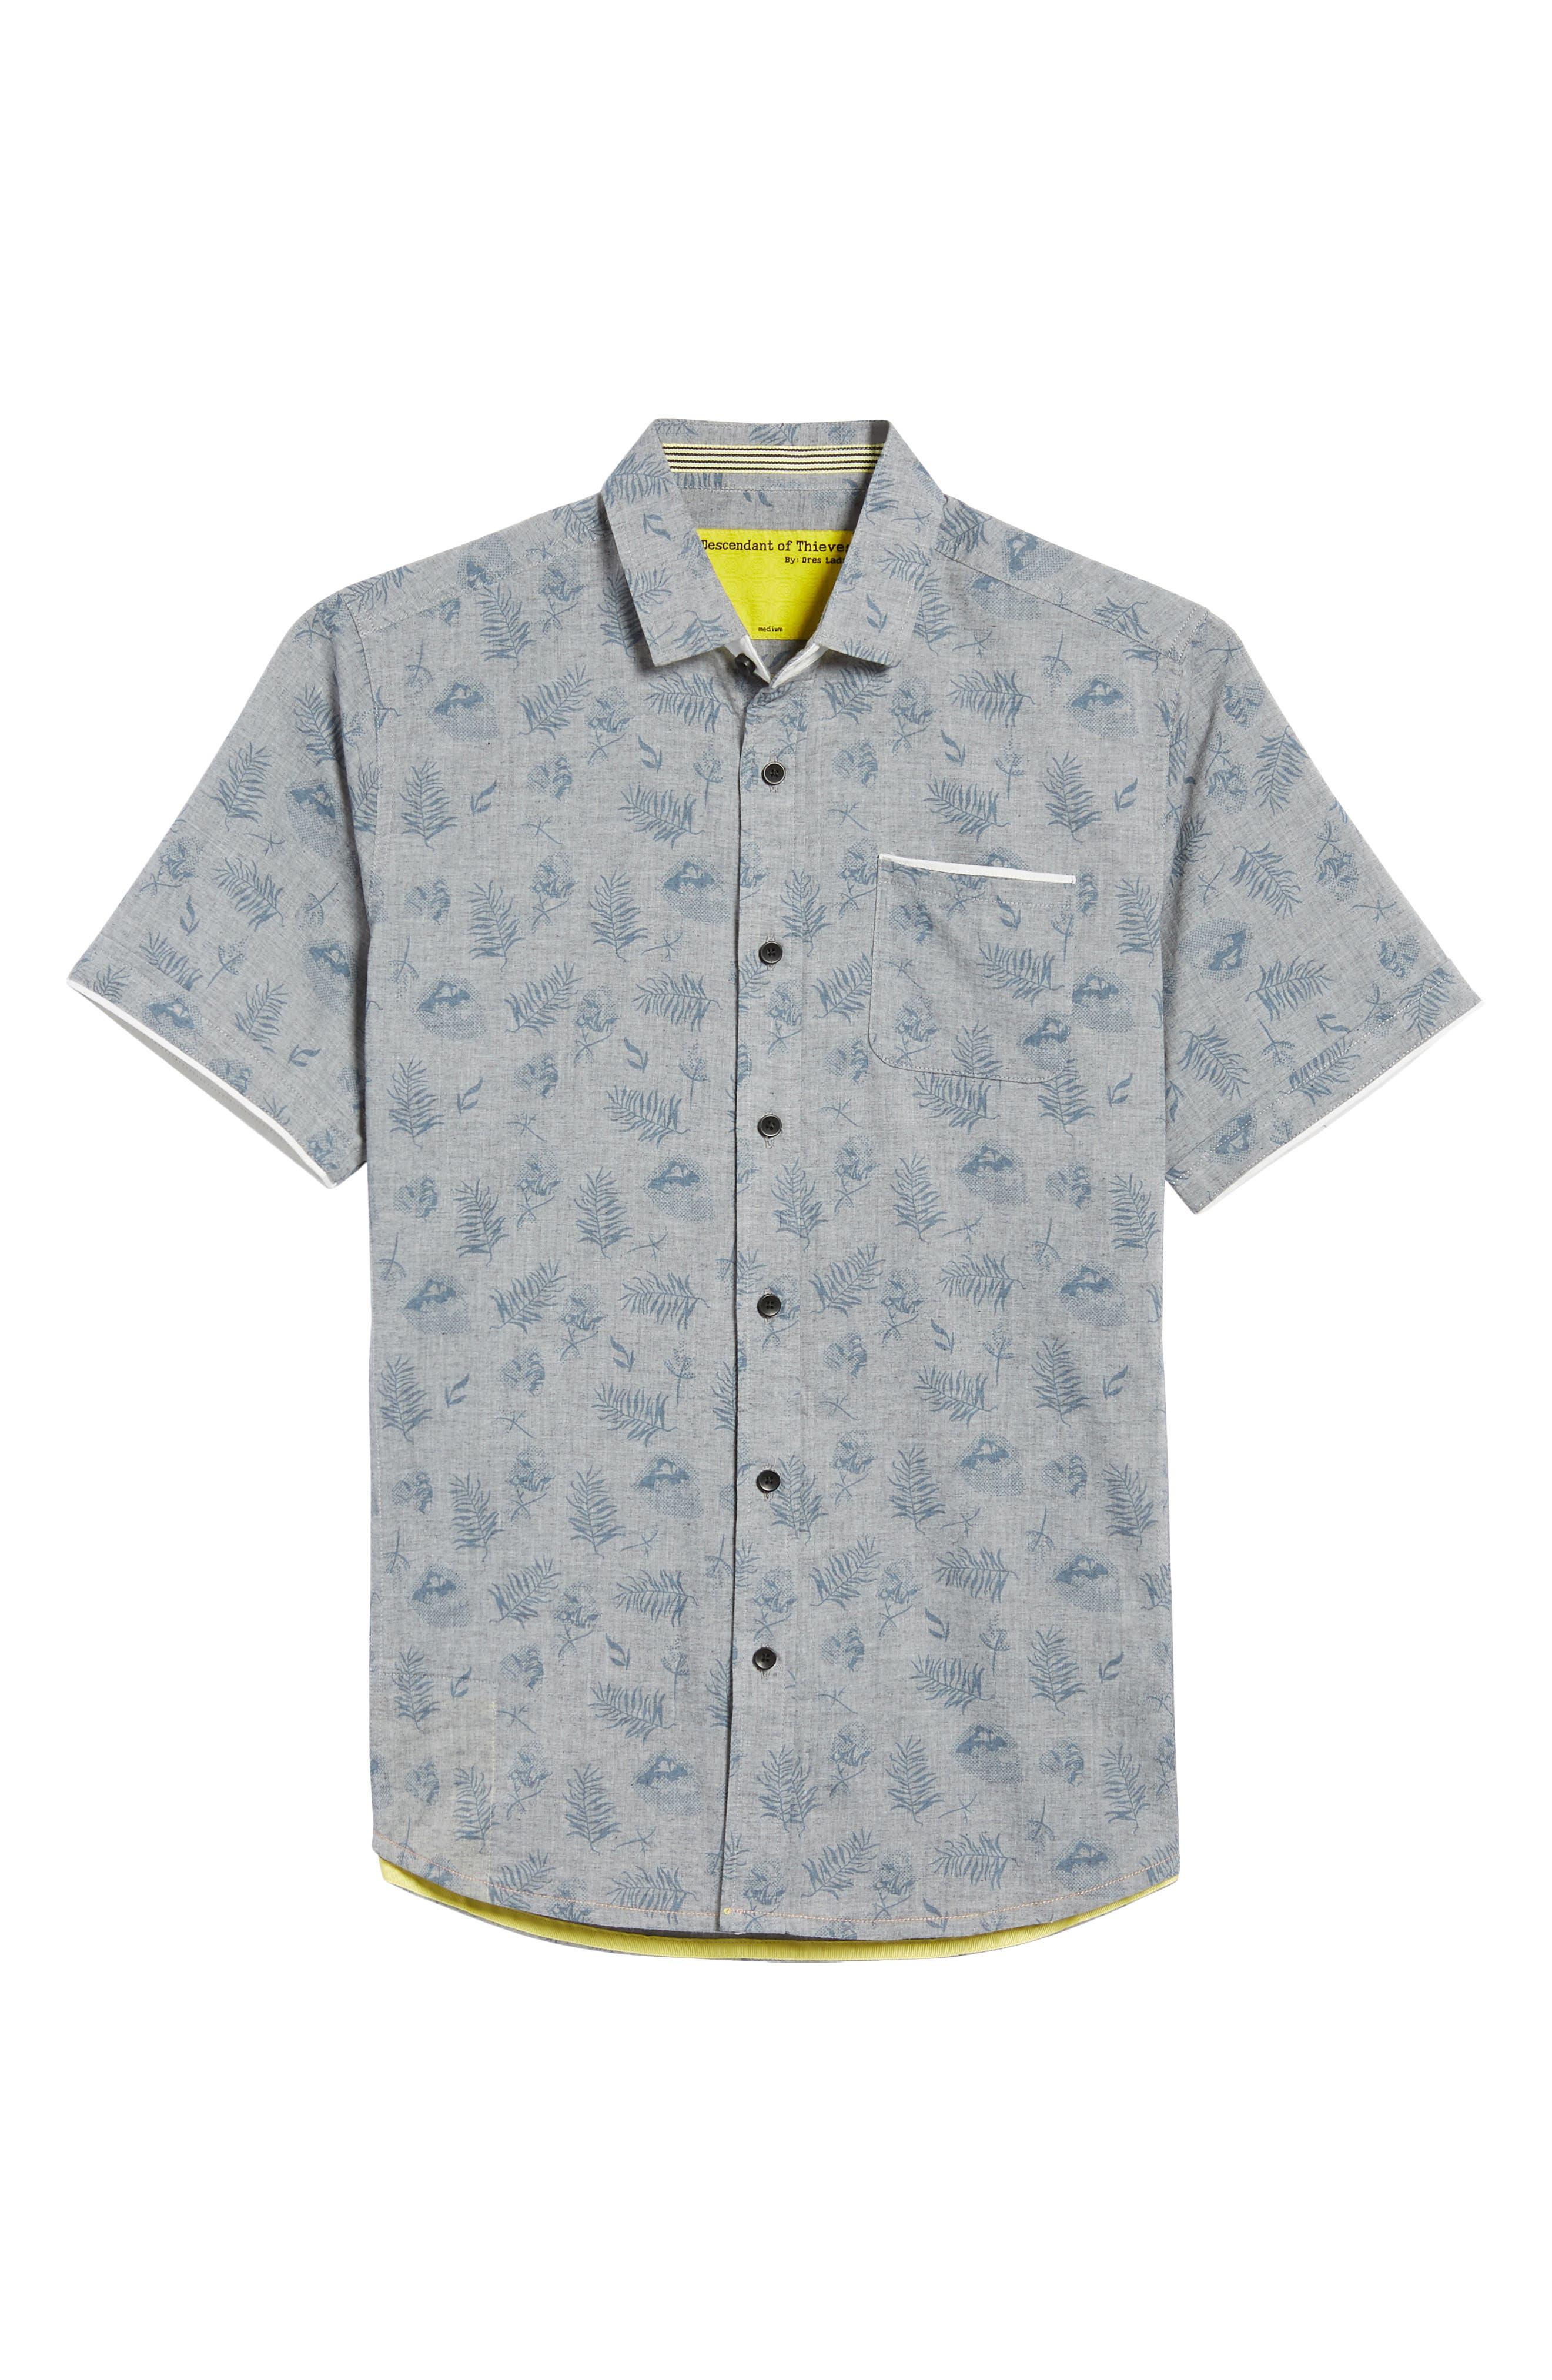 Rock Steady Woven Shirt,                             Alternate thumbnail 6, color,                             GREY